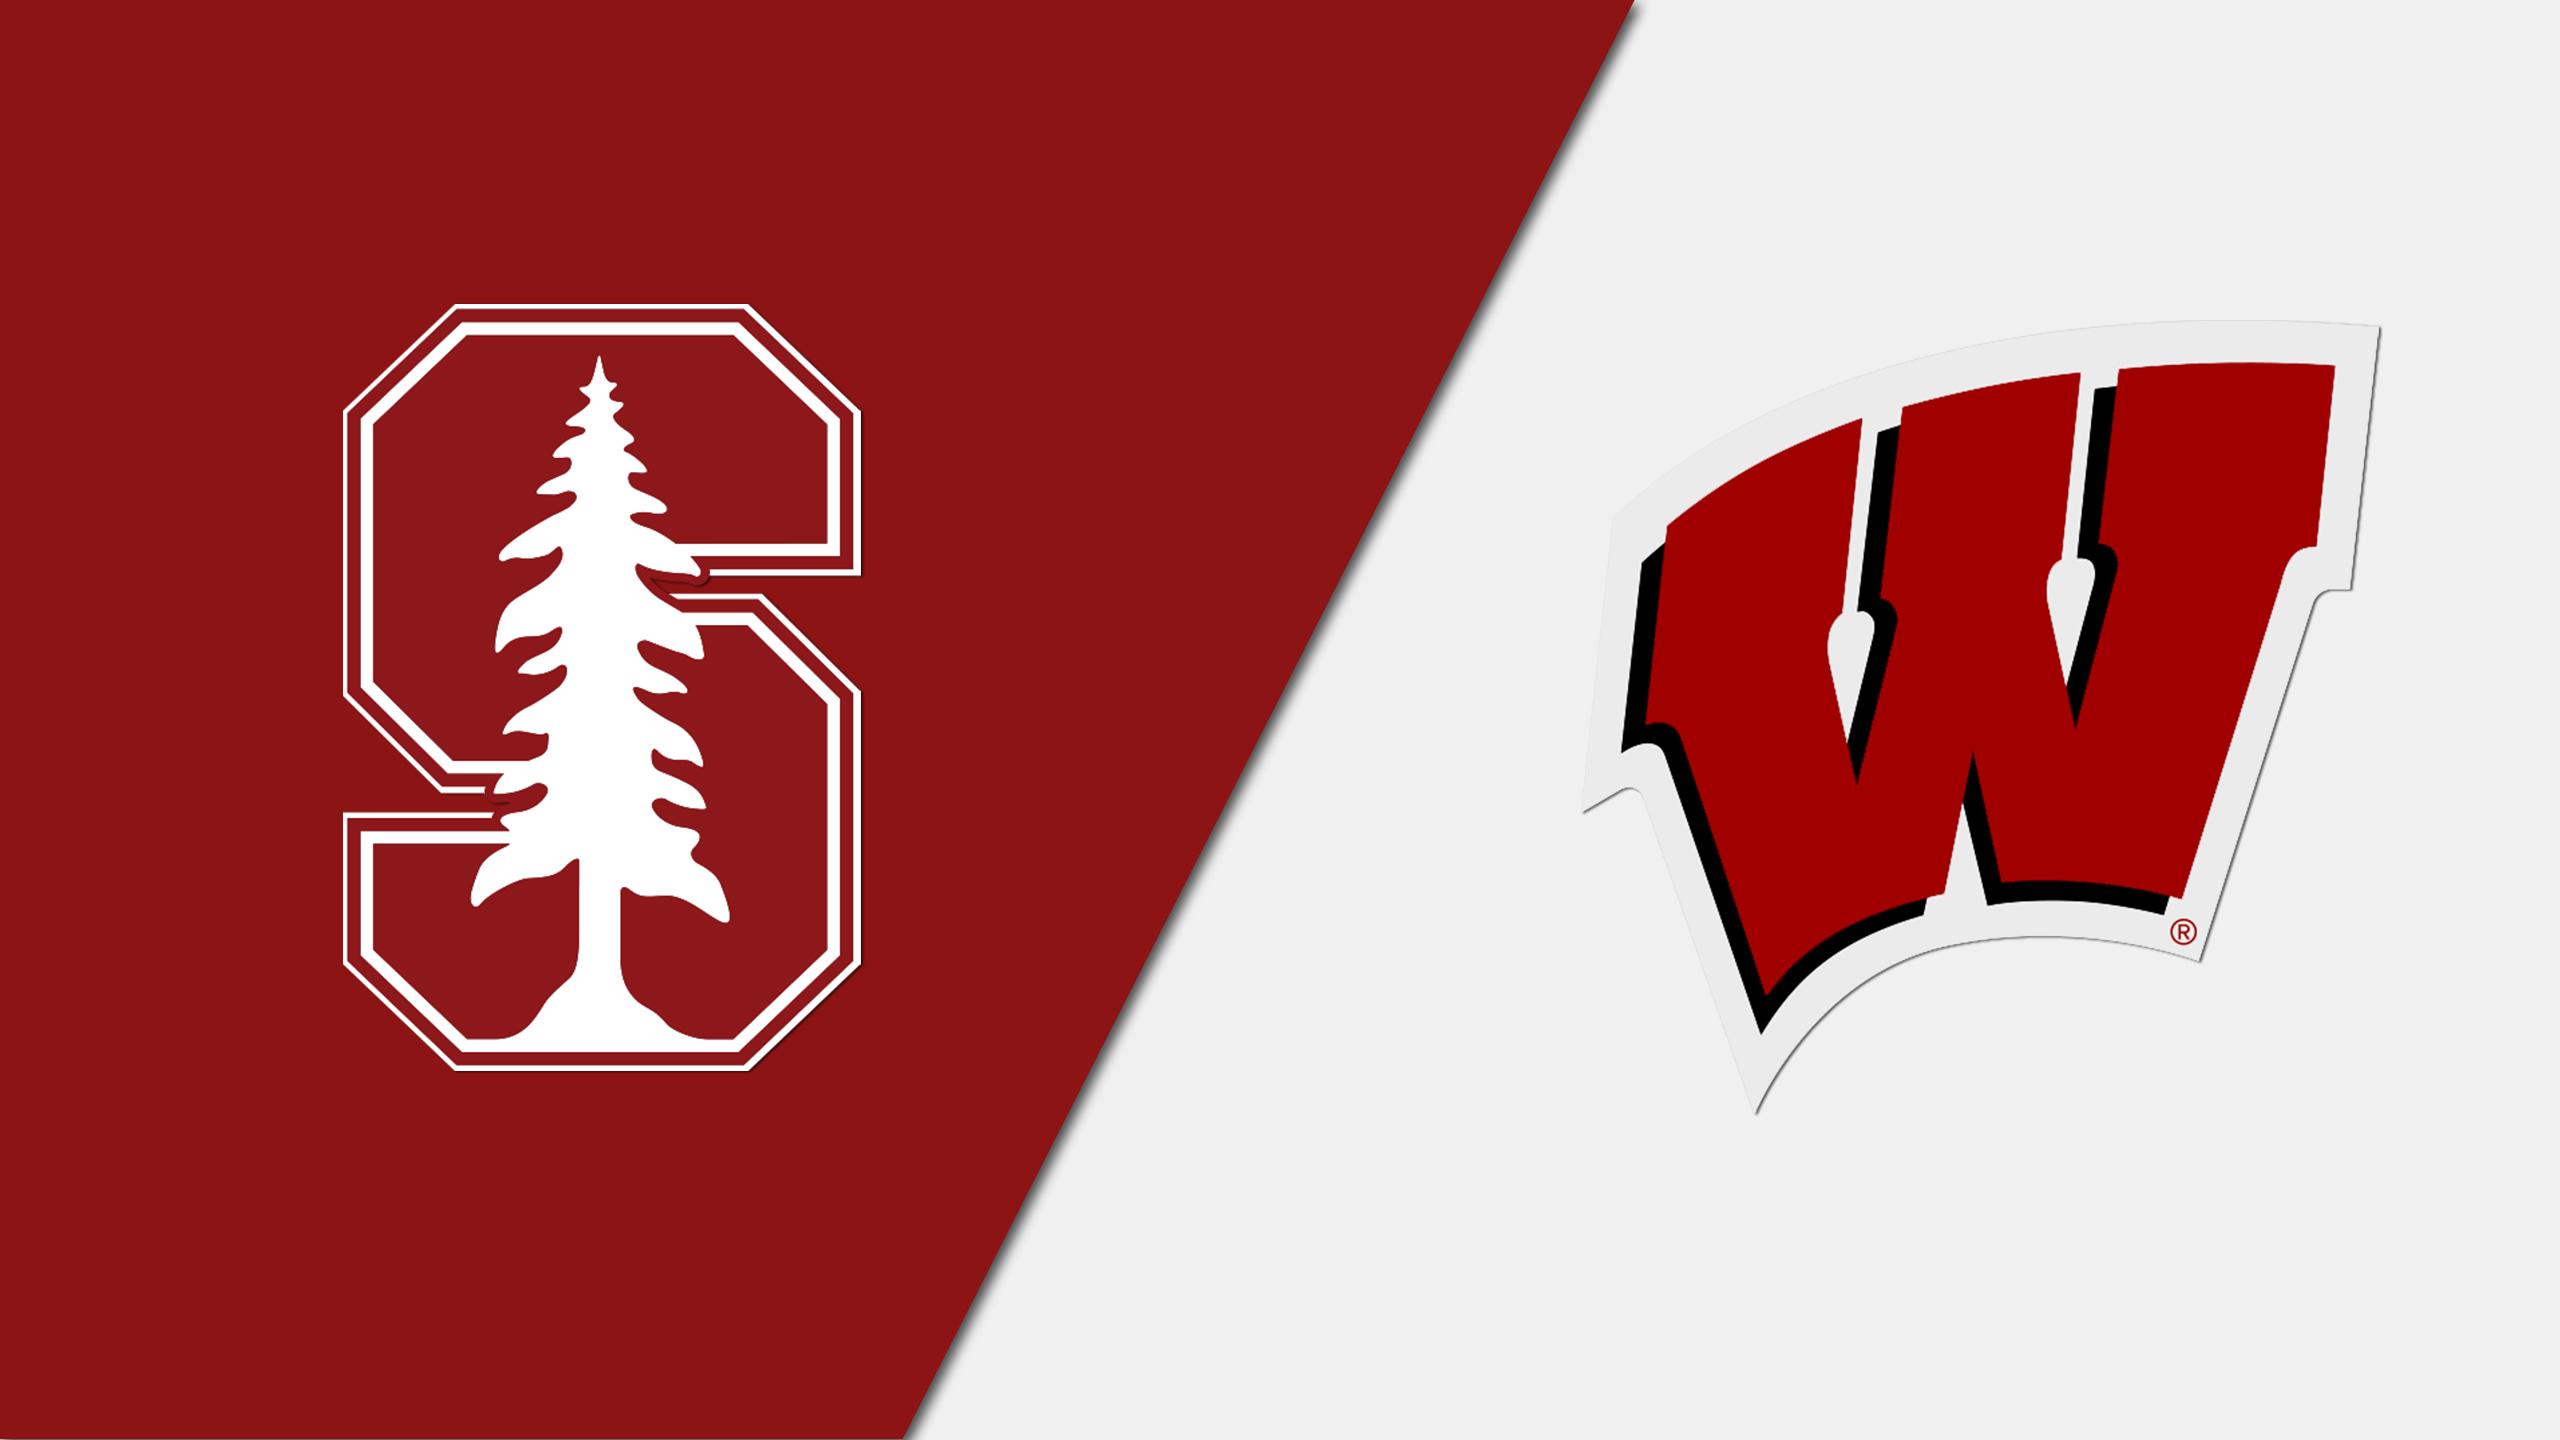 Stanford vs. #25 Wisconsin (Quarterfinal #2) (Battle 4 Atlantis)